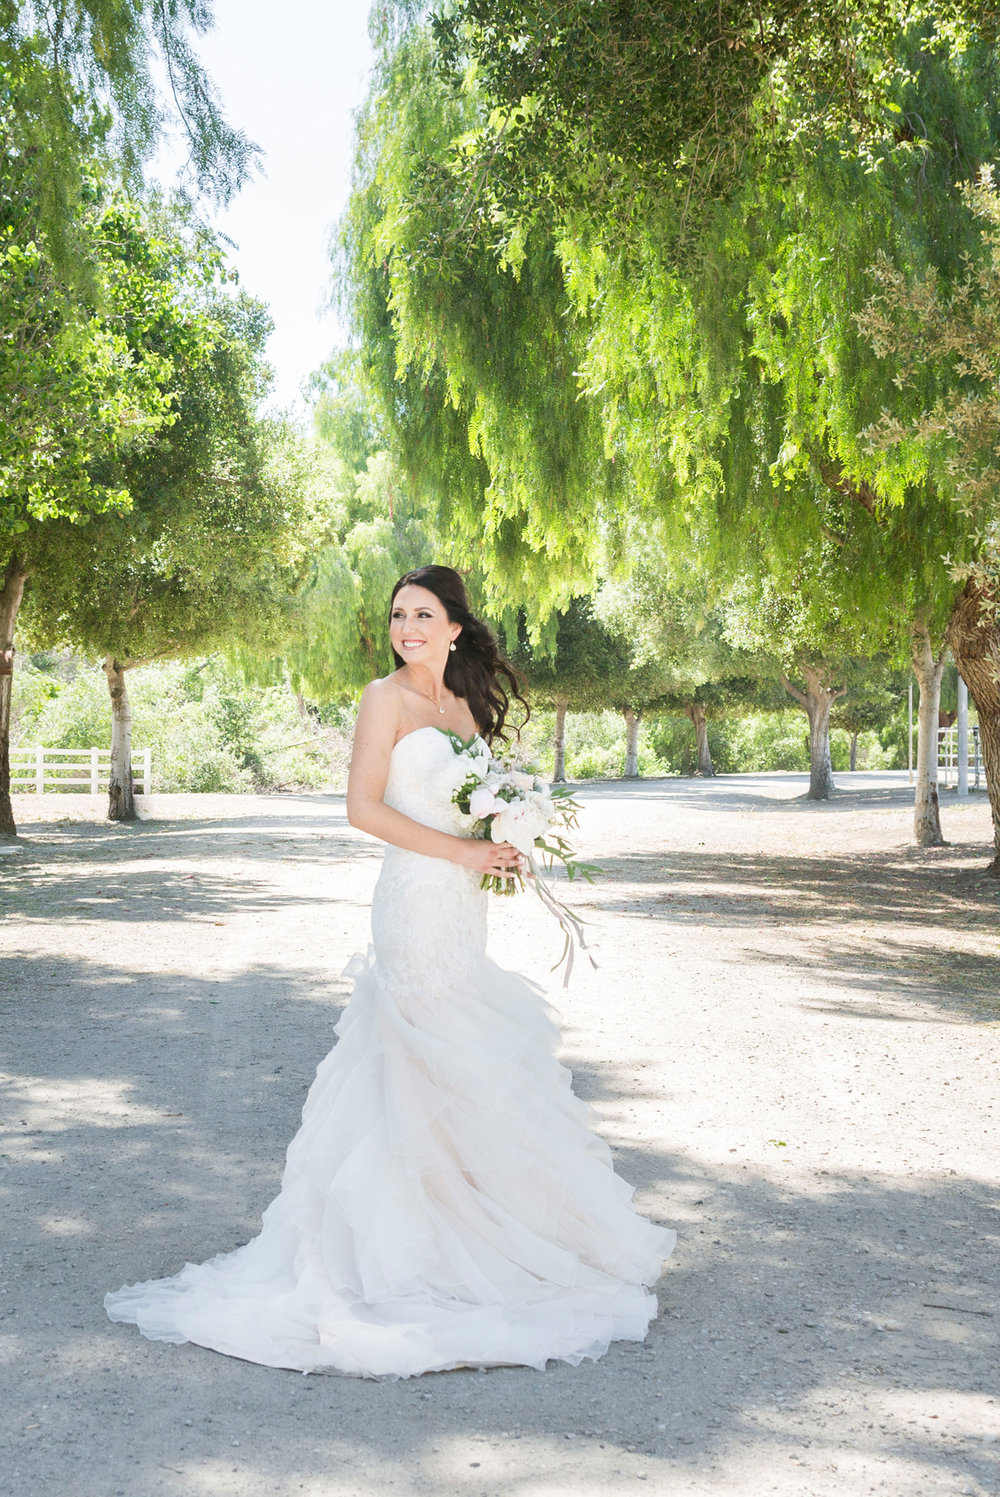 Lace + Light Blush Mermaid Wedding Dress - A McCoy Equestrian Center Wedding - Peterson Design & Photography